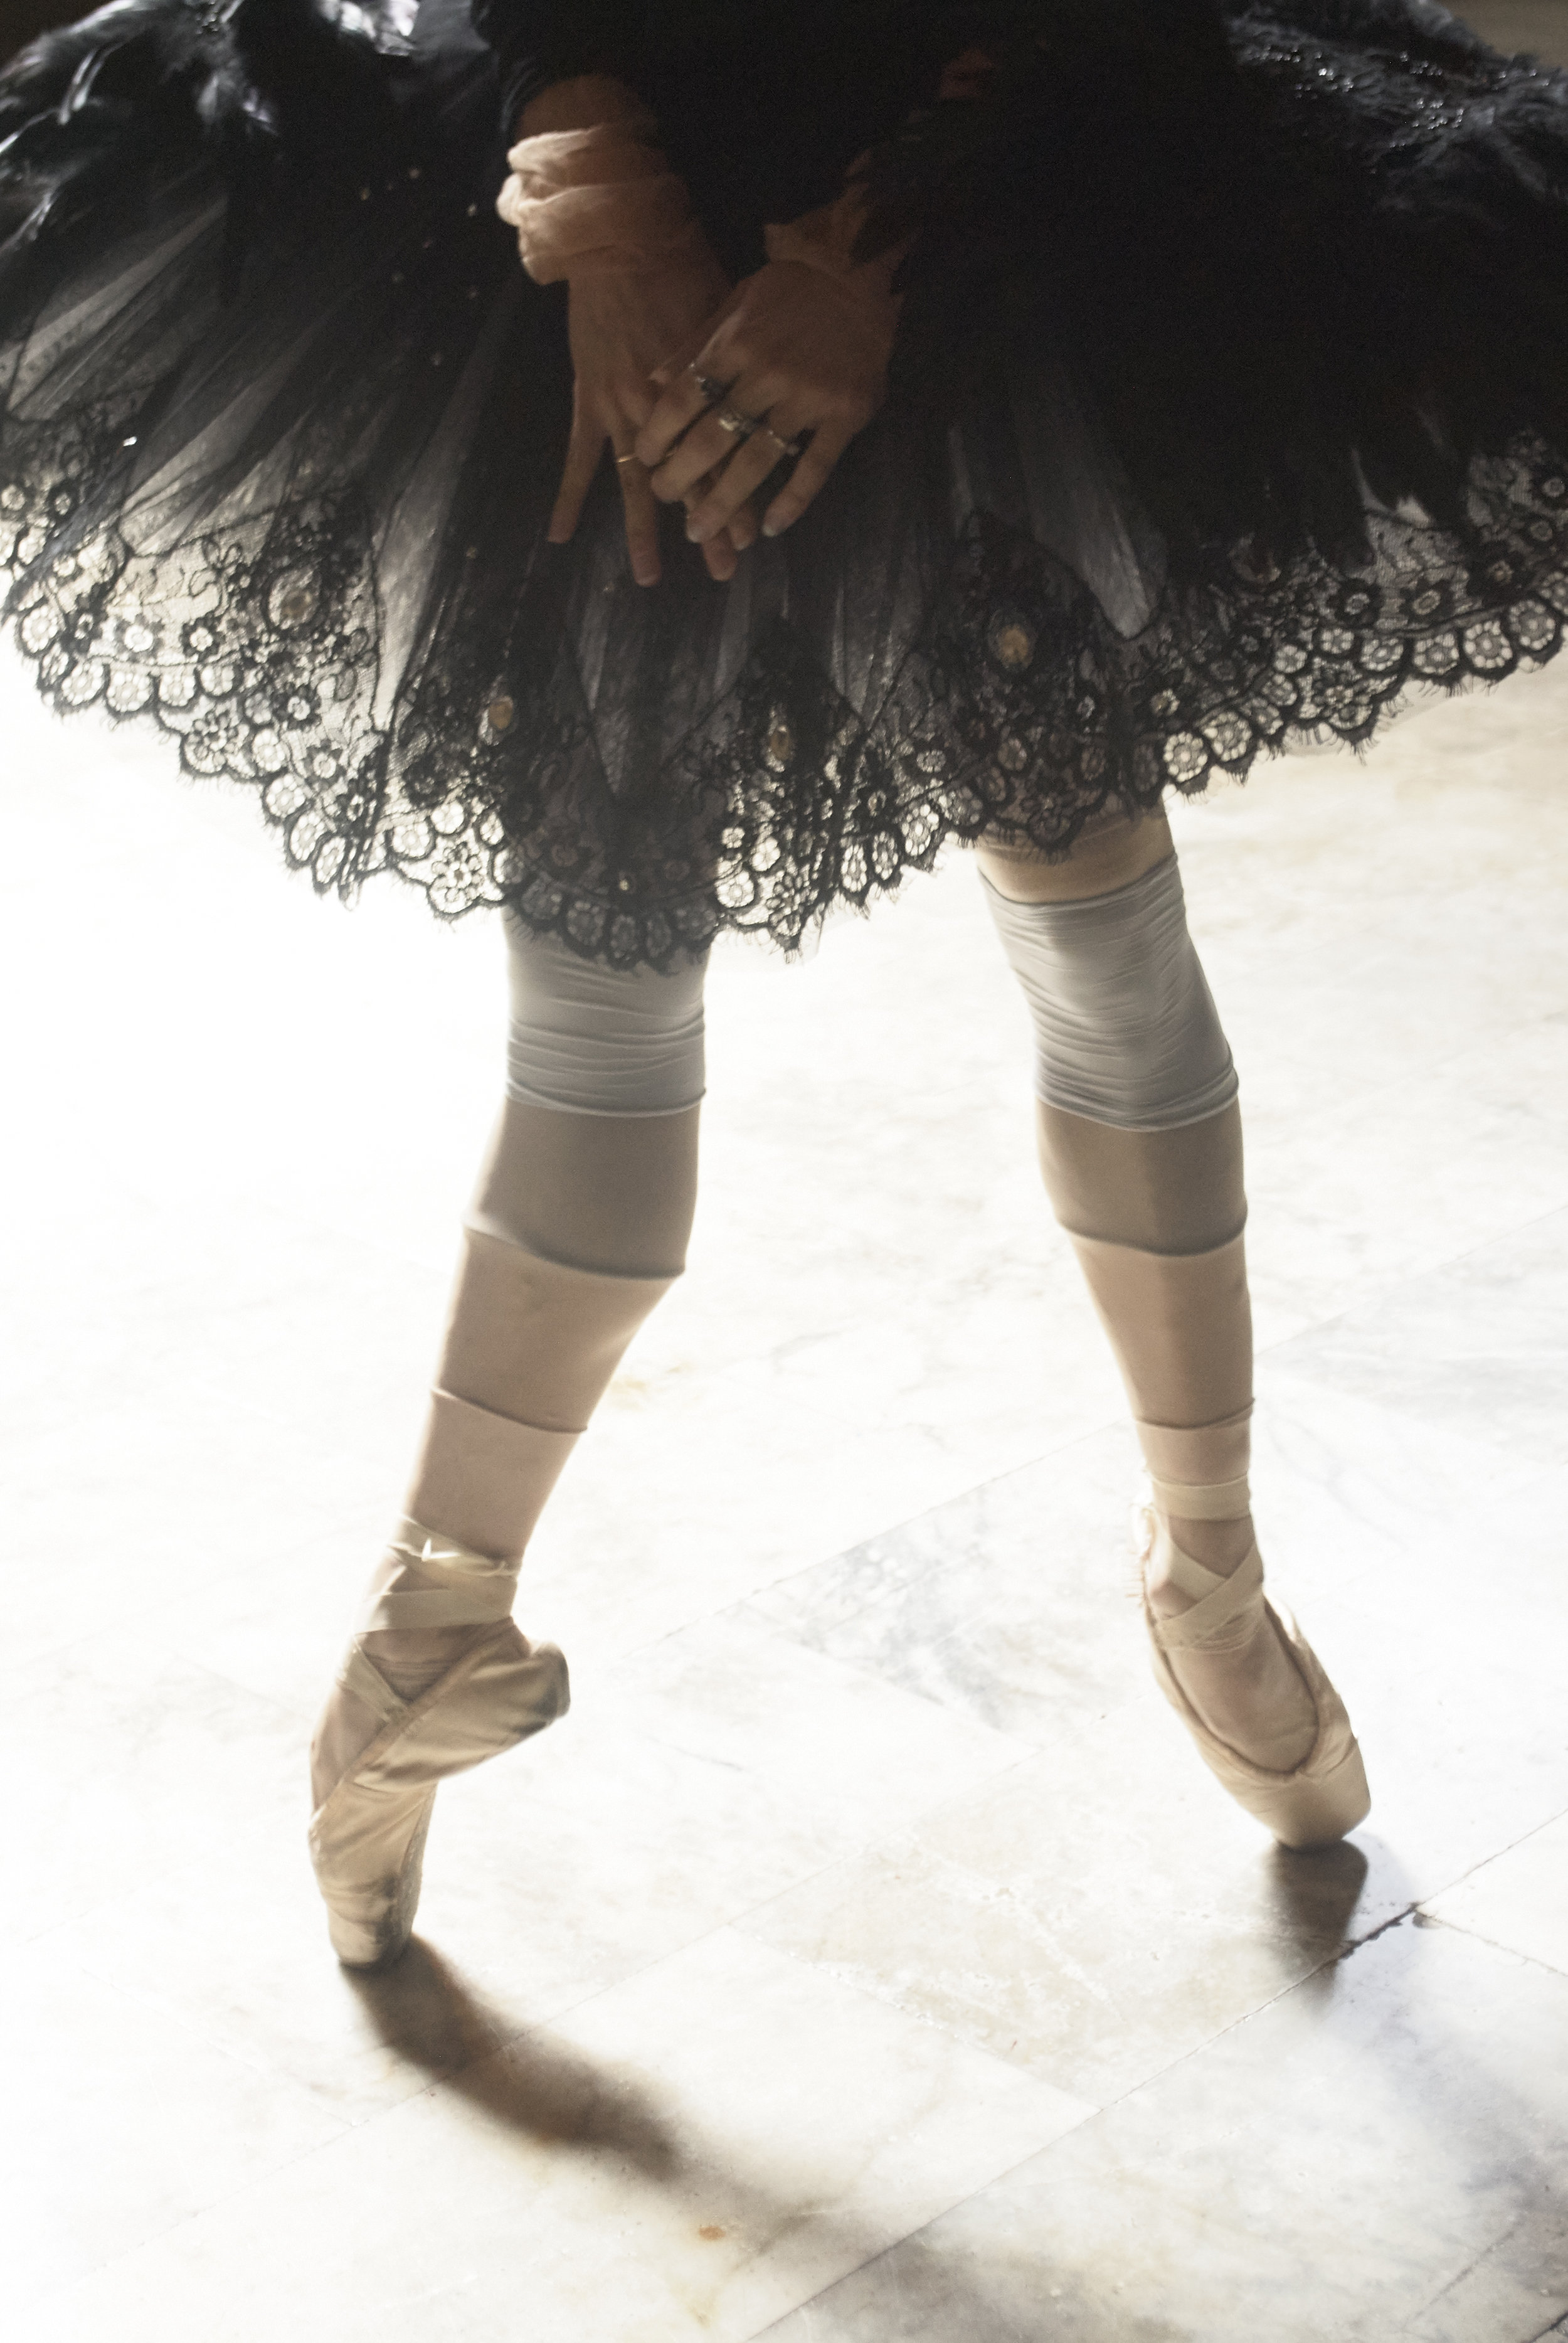 Tutu by Yi Li, BFA Fashion Design. Leotard and Pointe Shoes, model's own. All stockings, stylist's own.